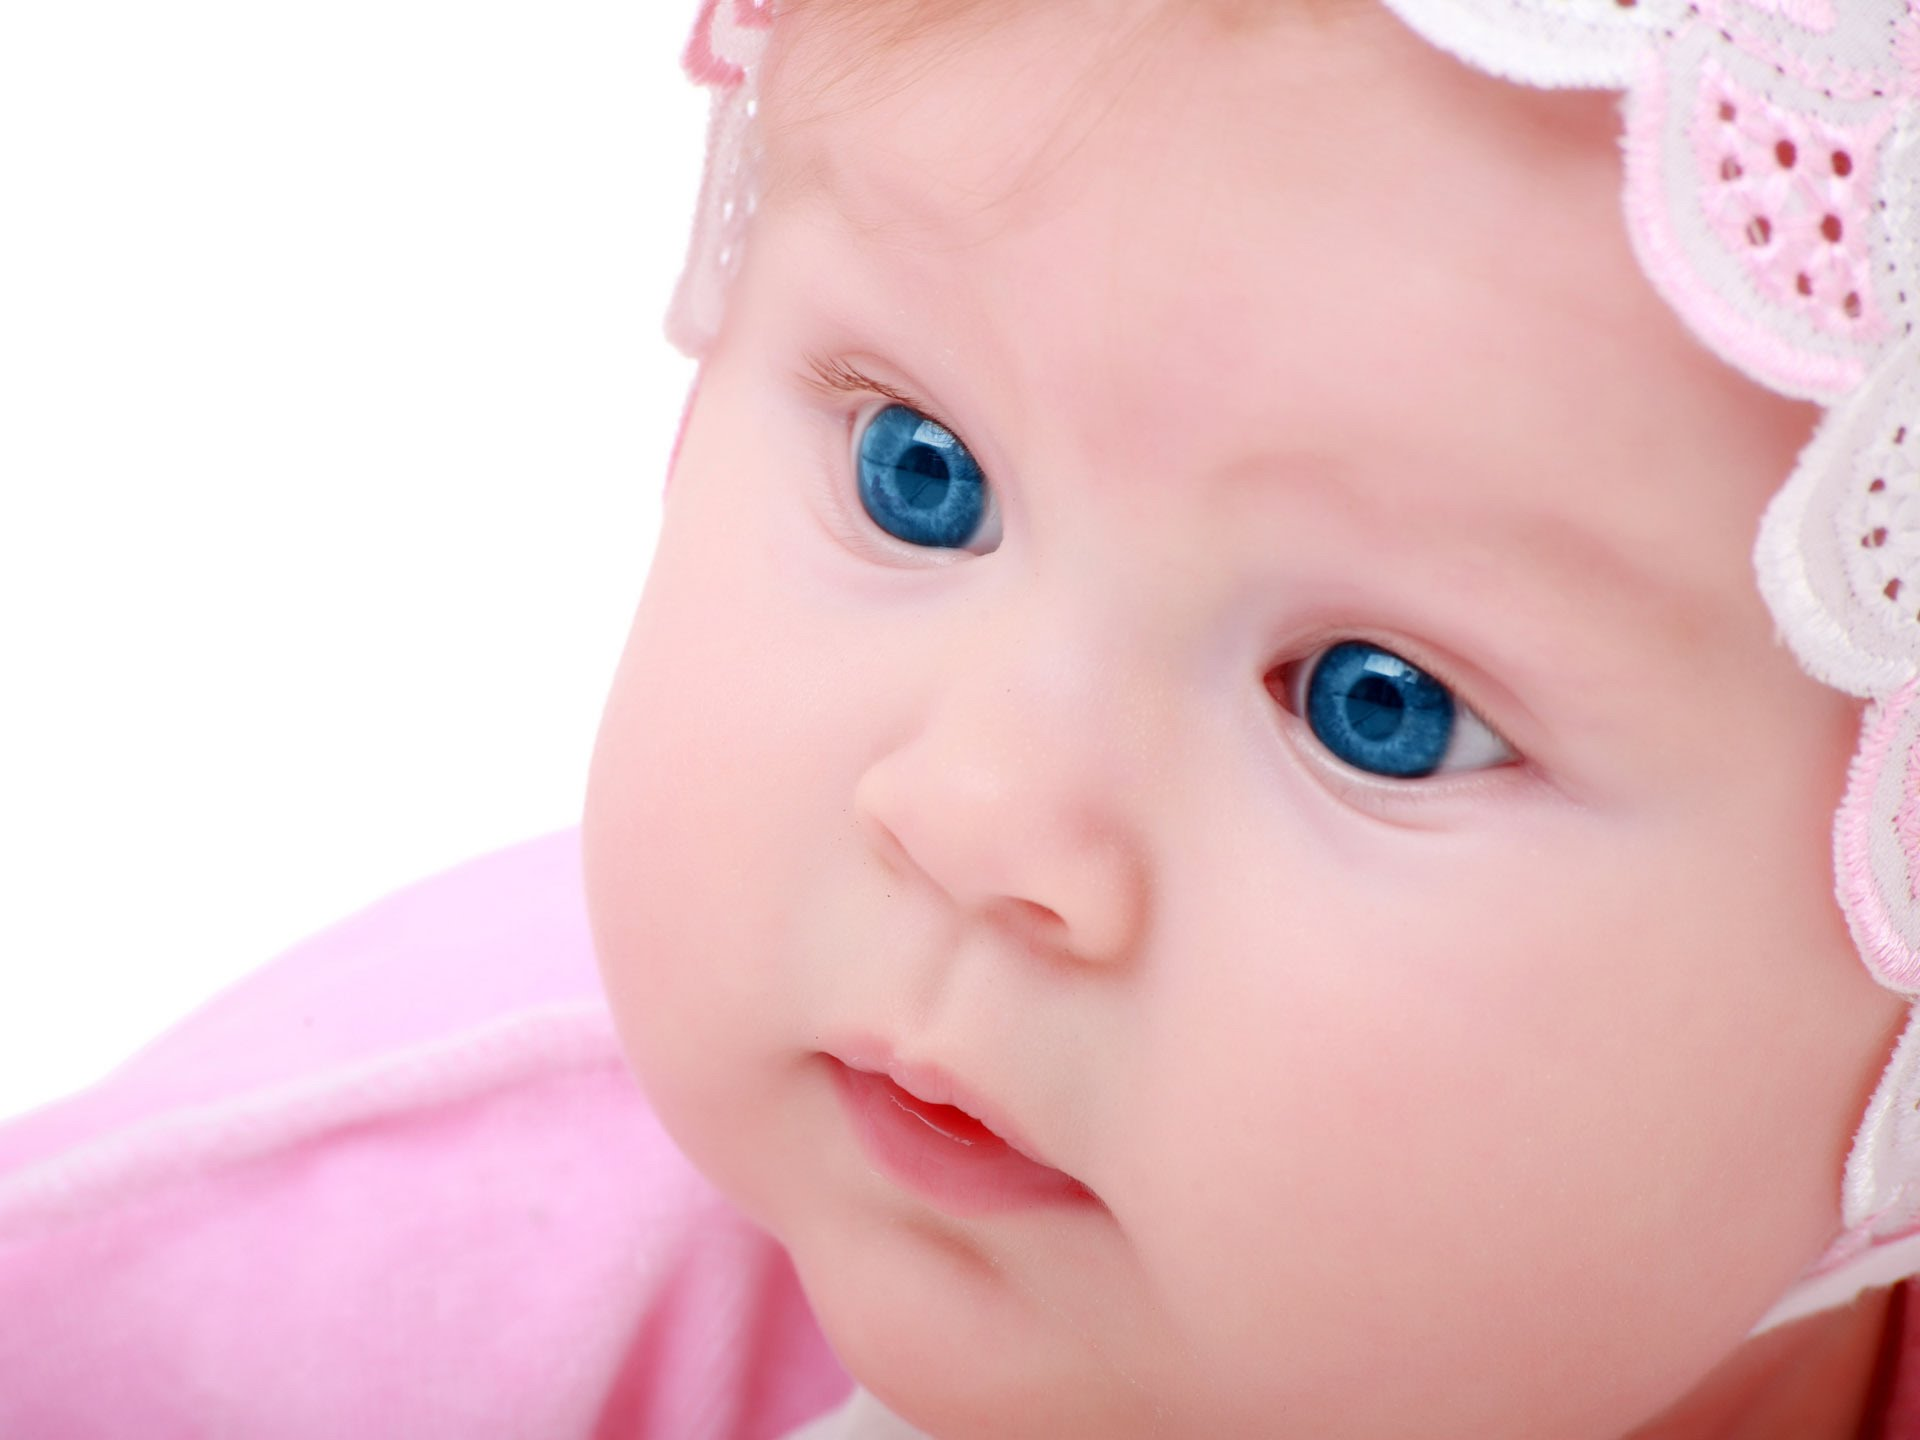 بالصور صور اطفال صغار , اجمل صورة طفل كيوت 2291 11